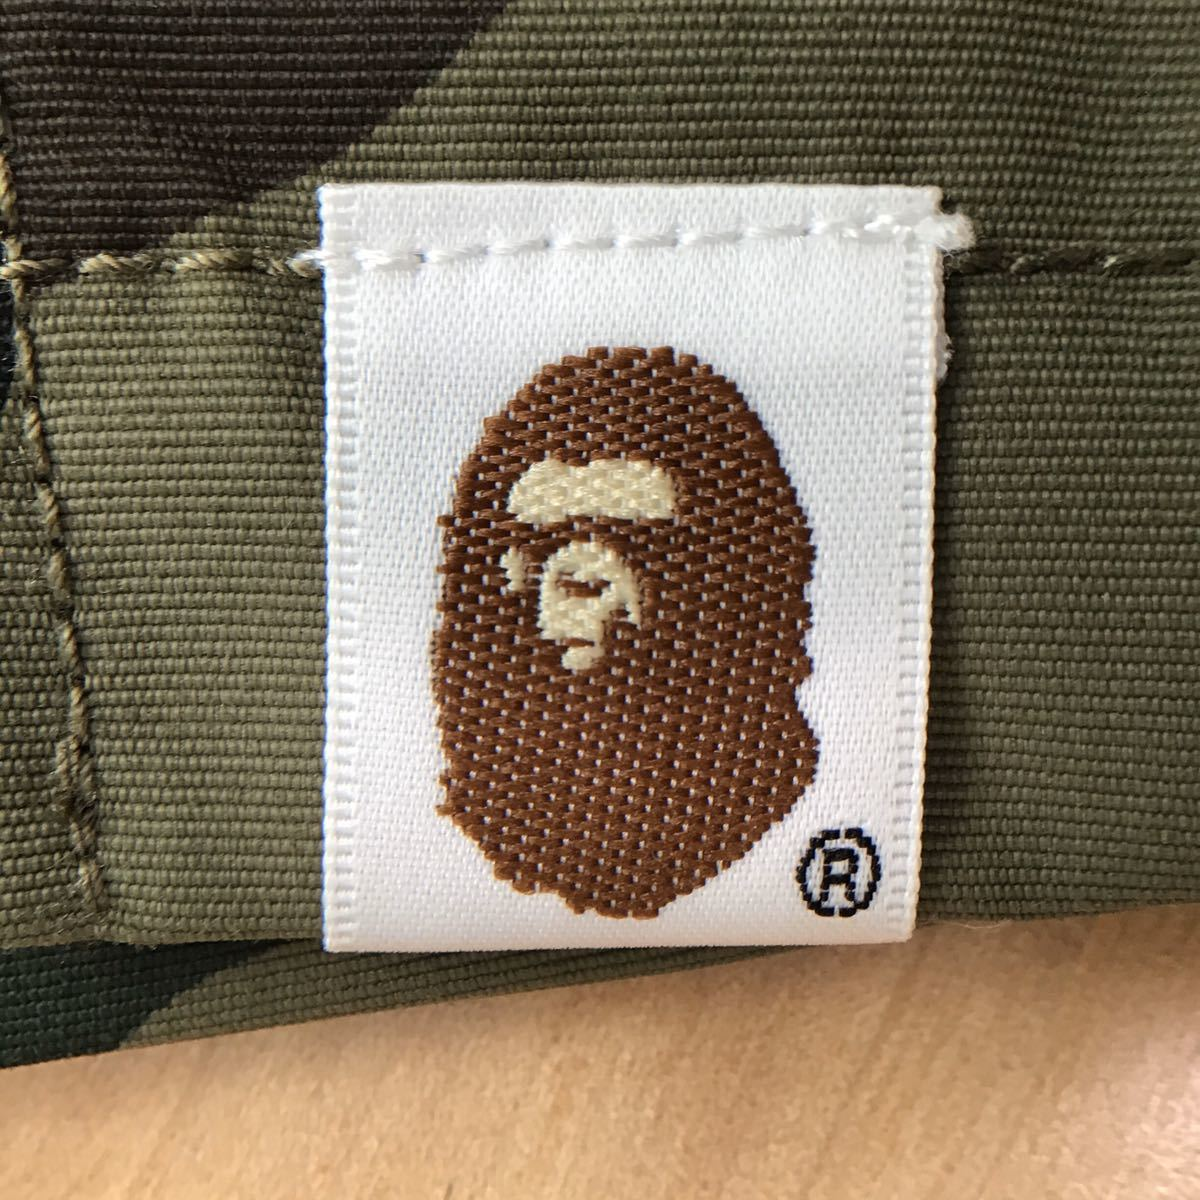 1st camo ナイロン ジャケット Mサイズ a bathing ape BAPE エイプ ベイプ アベイシングエイプ ブルゾン 迷彩 nylon jacket 9432